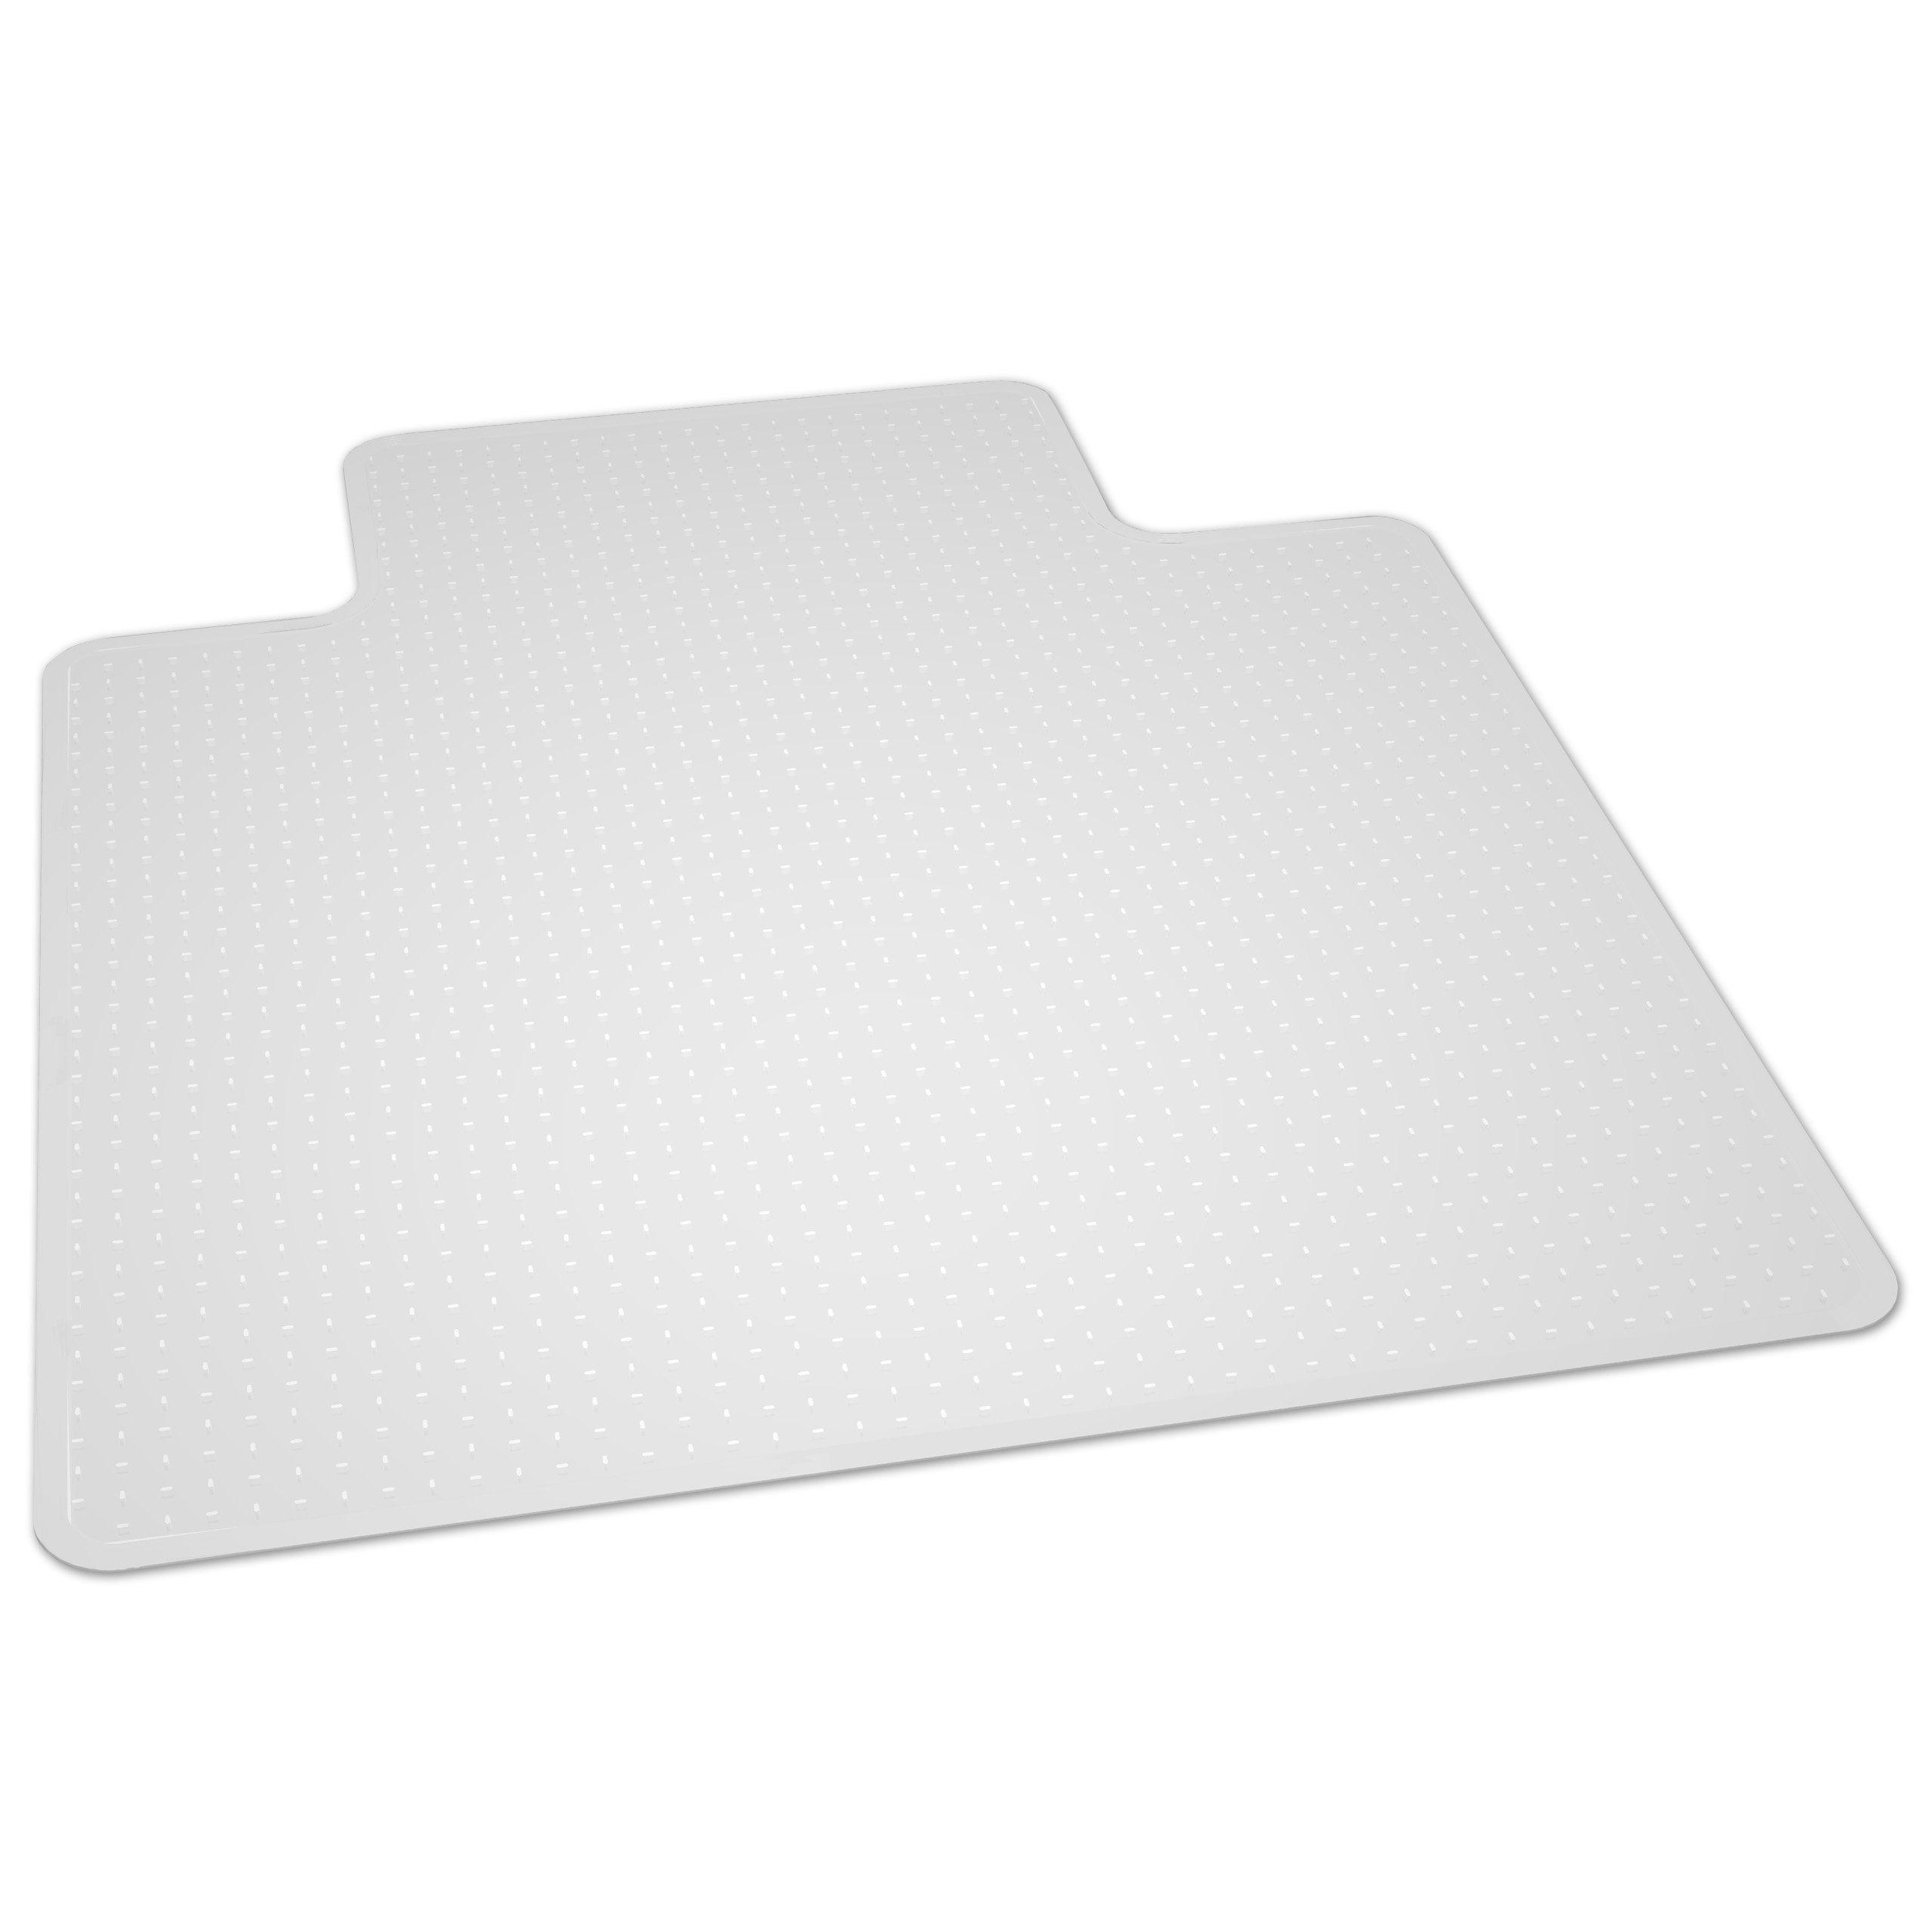 ES Robbins Natural Origin Lipped Vinyl Chair Mat for Carpet, 45 by 53-Inch, Clear